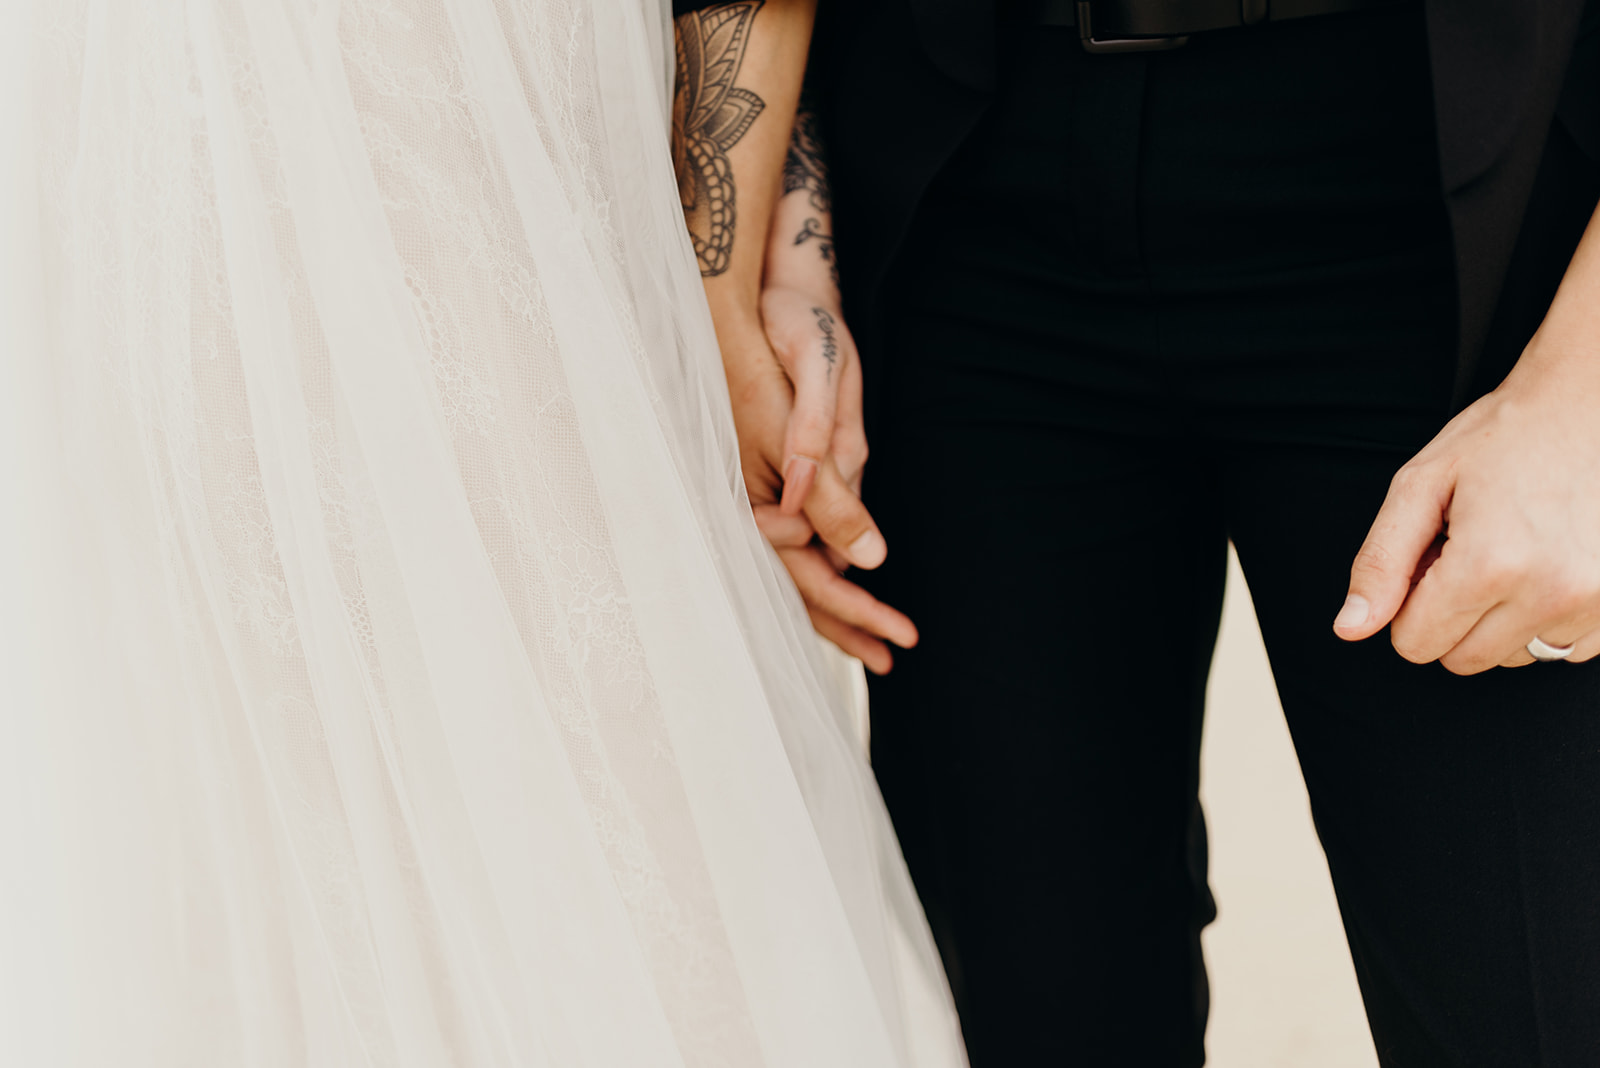 Modern Luxe Lesbian Wedding - The Calile Brisbane - Daphne Sky Studios Photography